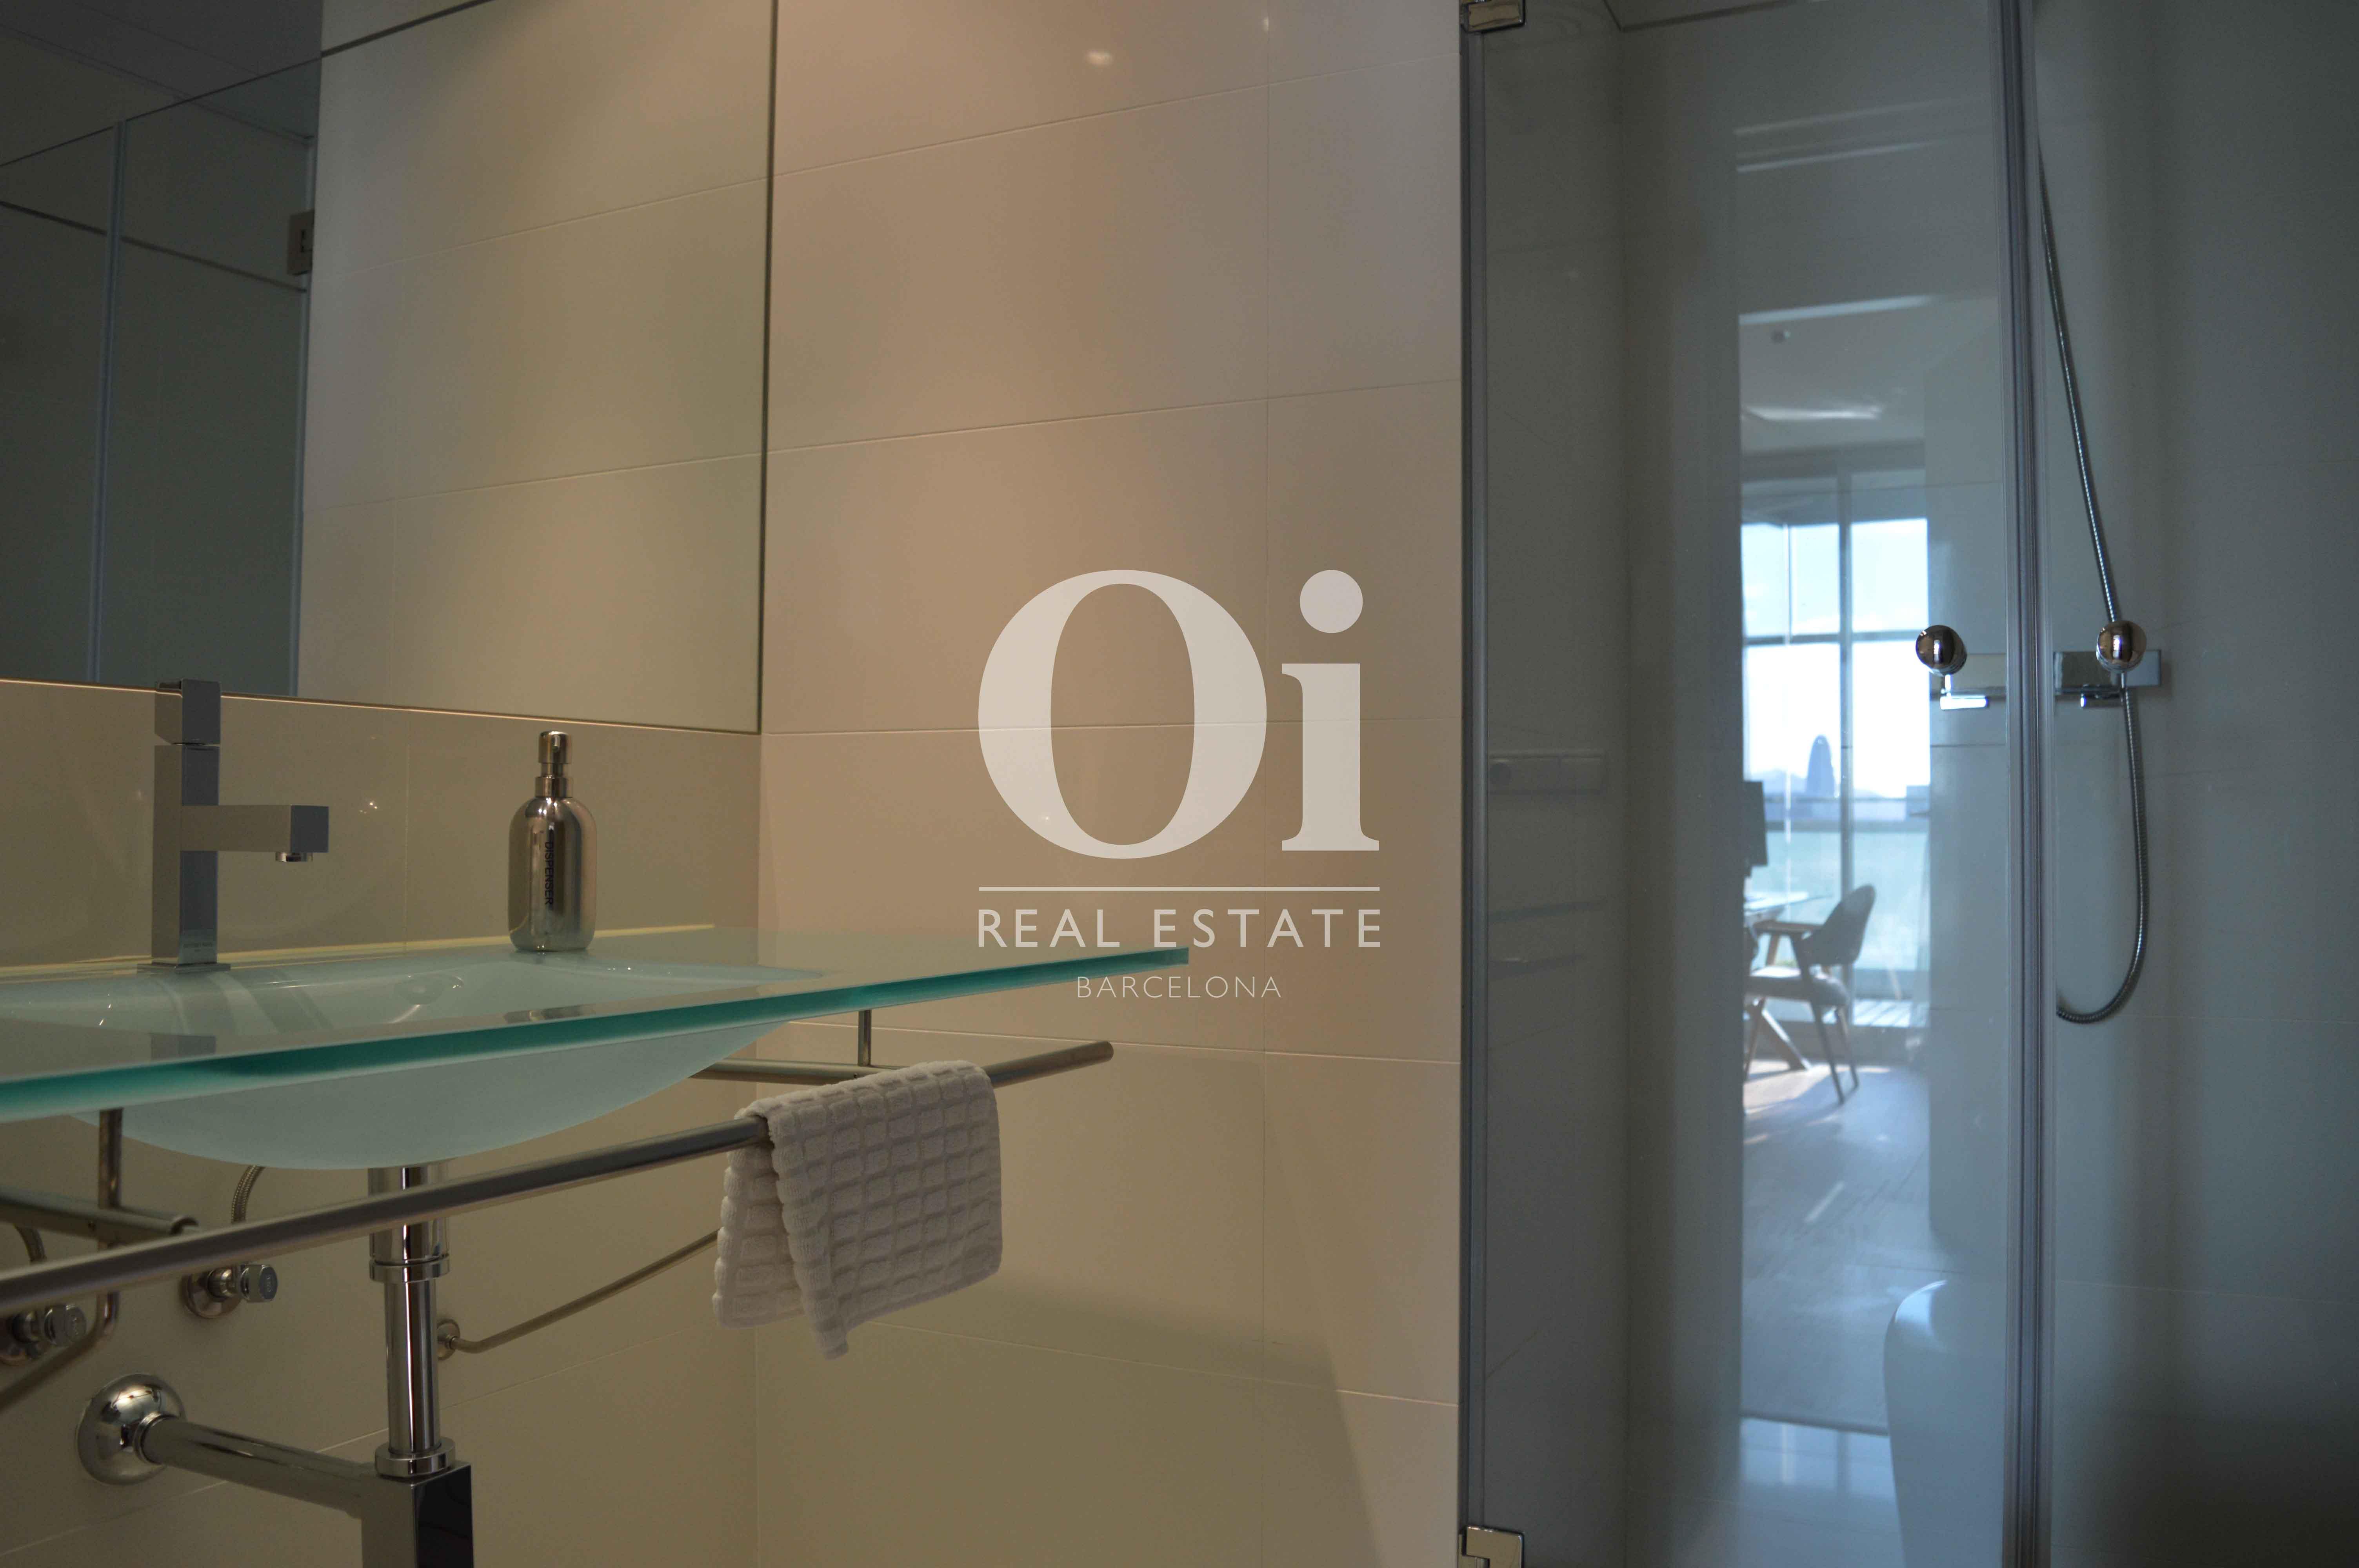 Удобная и светлая ванная комната в апартаментах на продажу в районе Diagonal Mar Барселоны